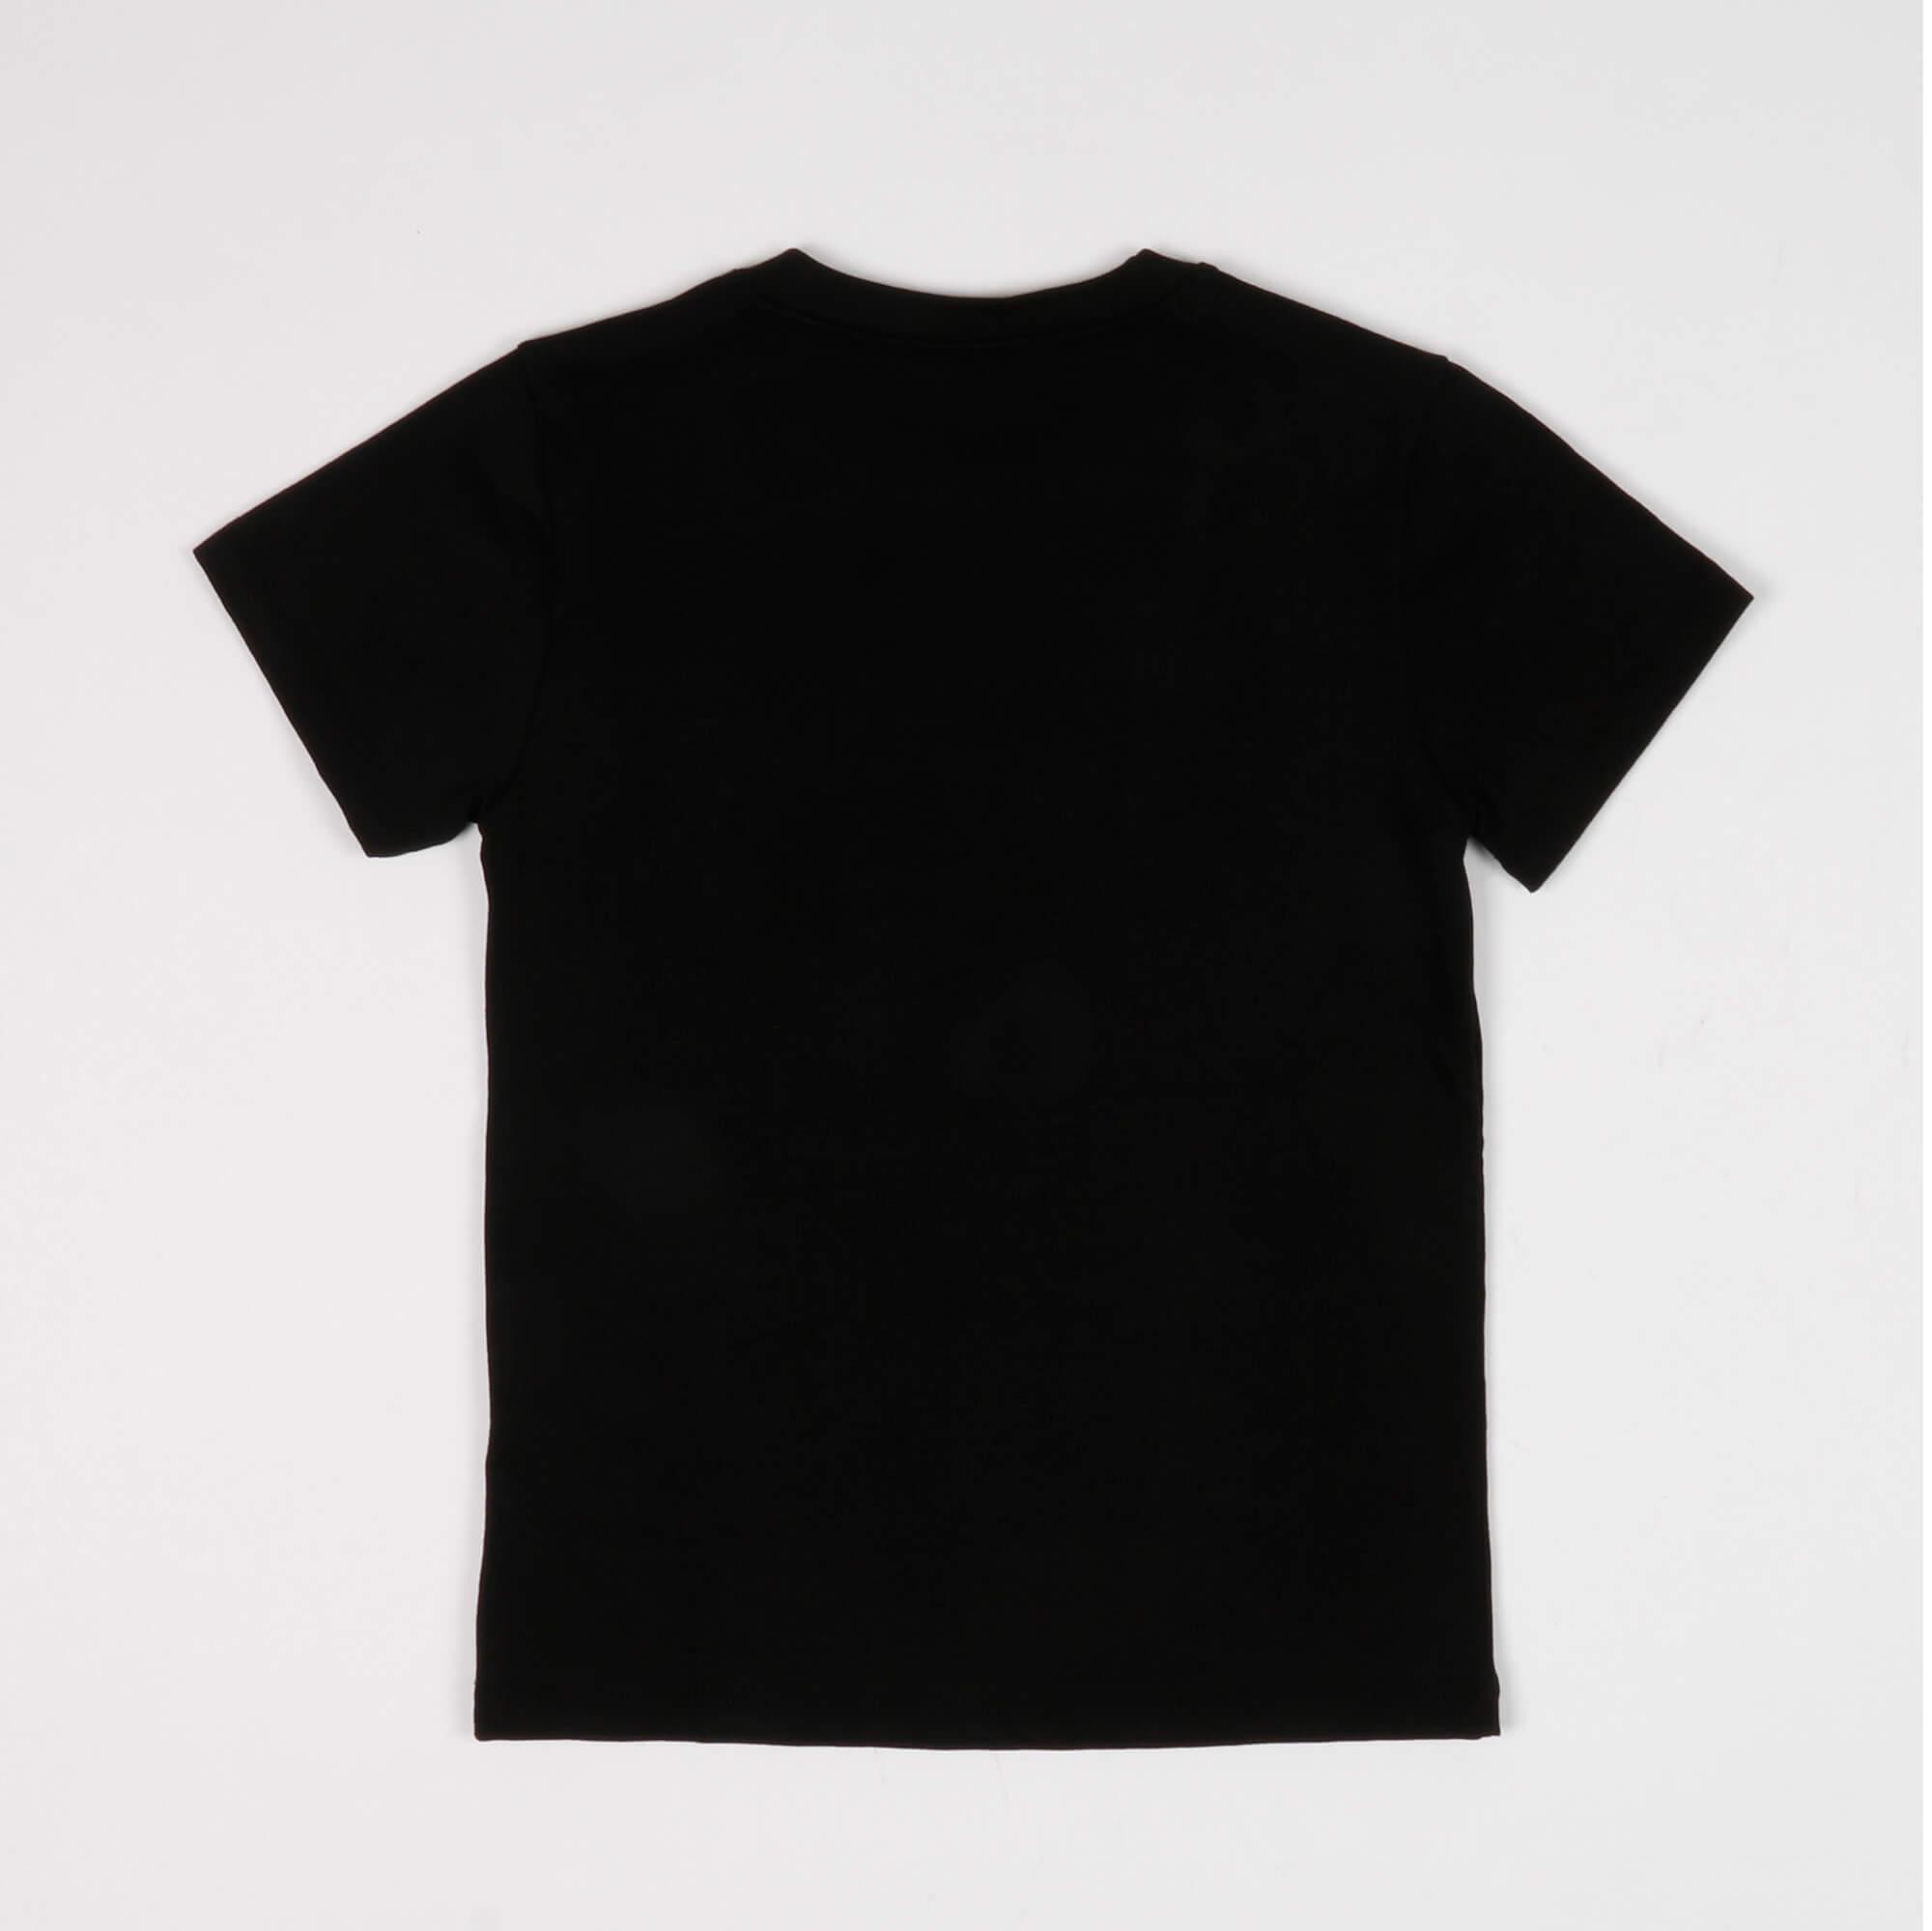 T-shirt taschino fantasia - Nero